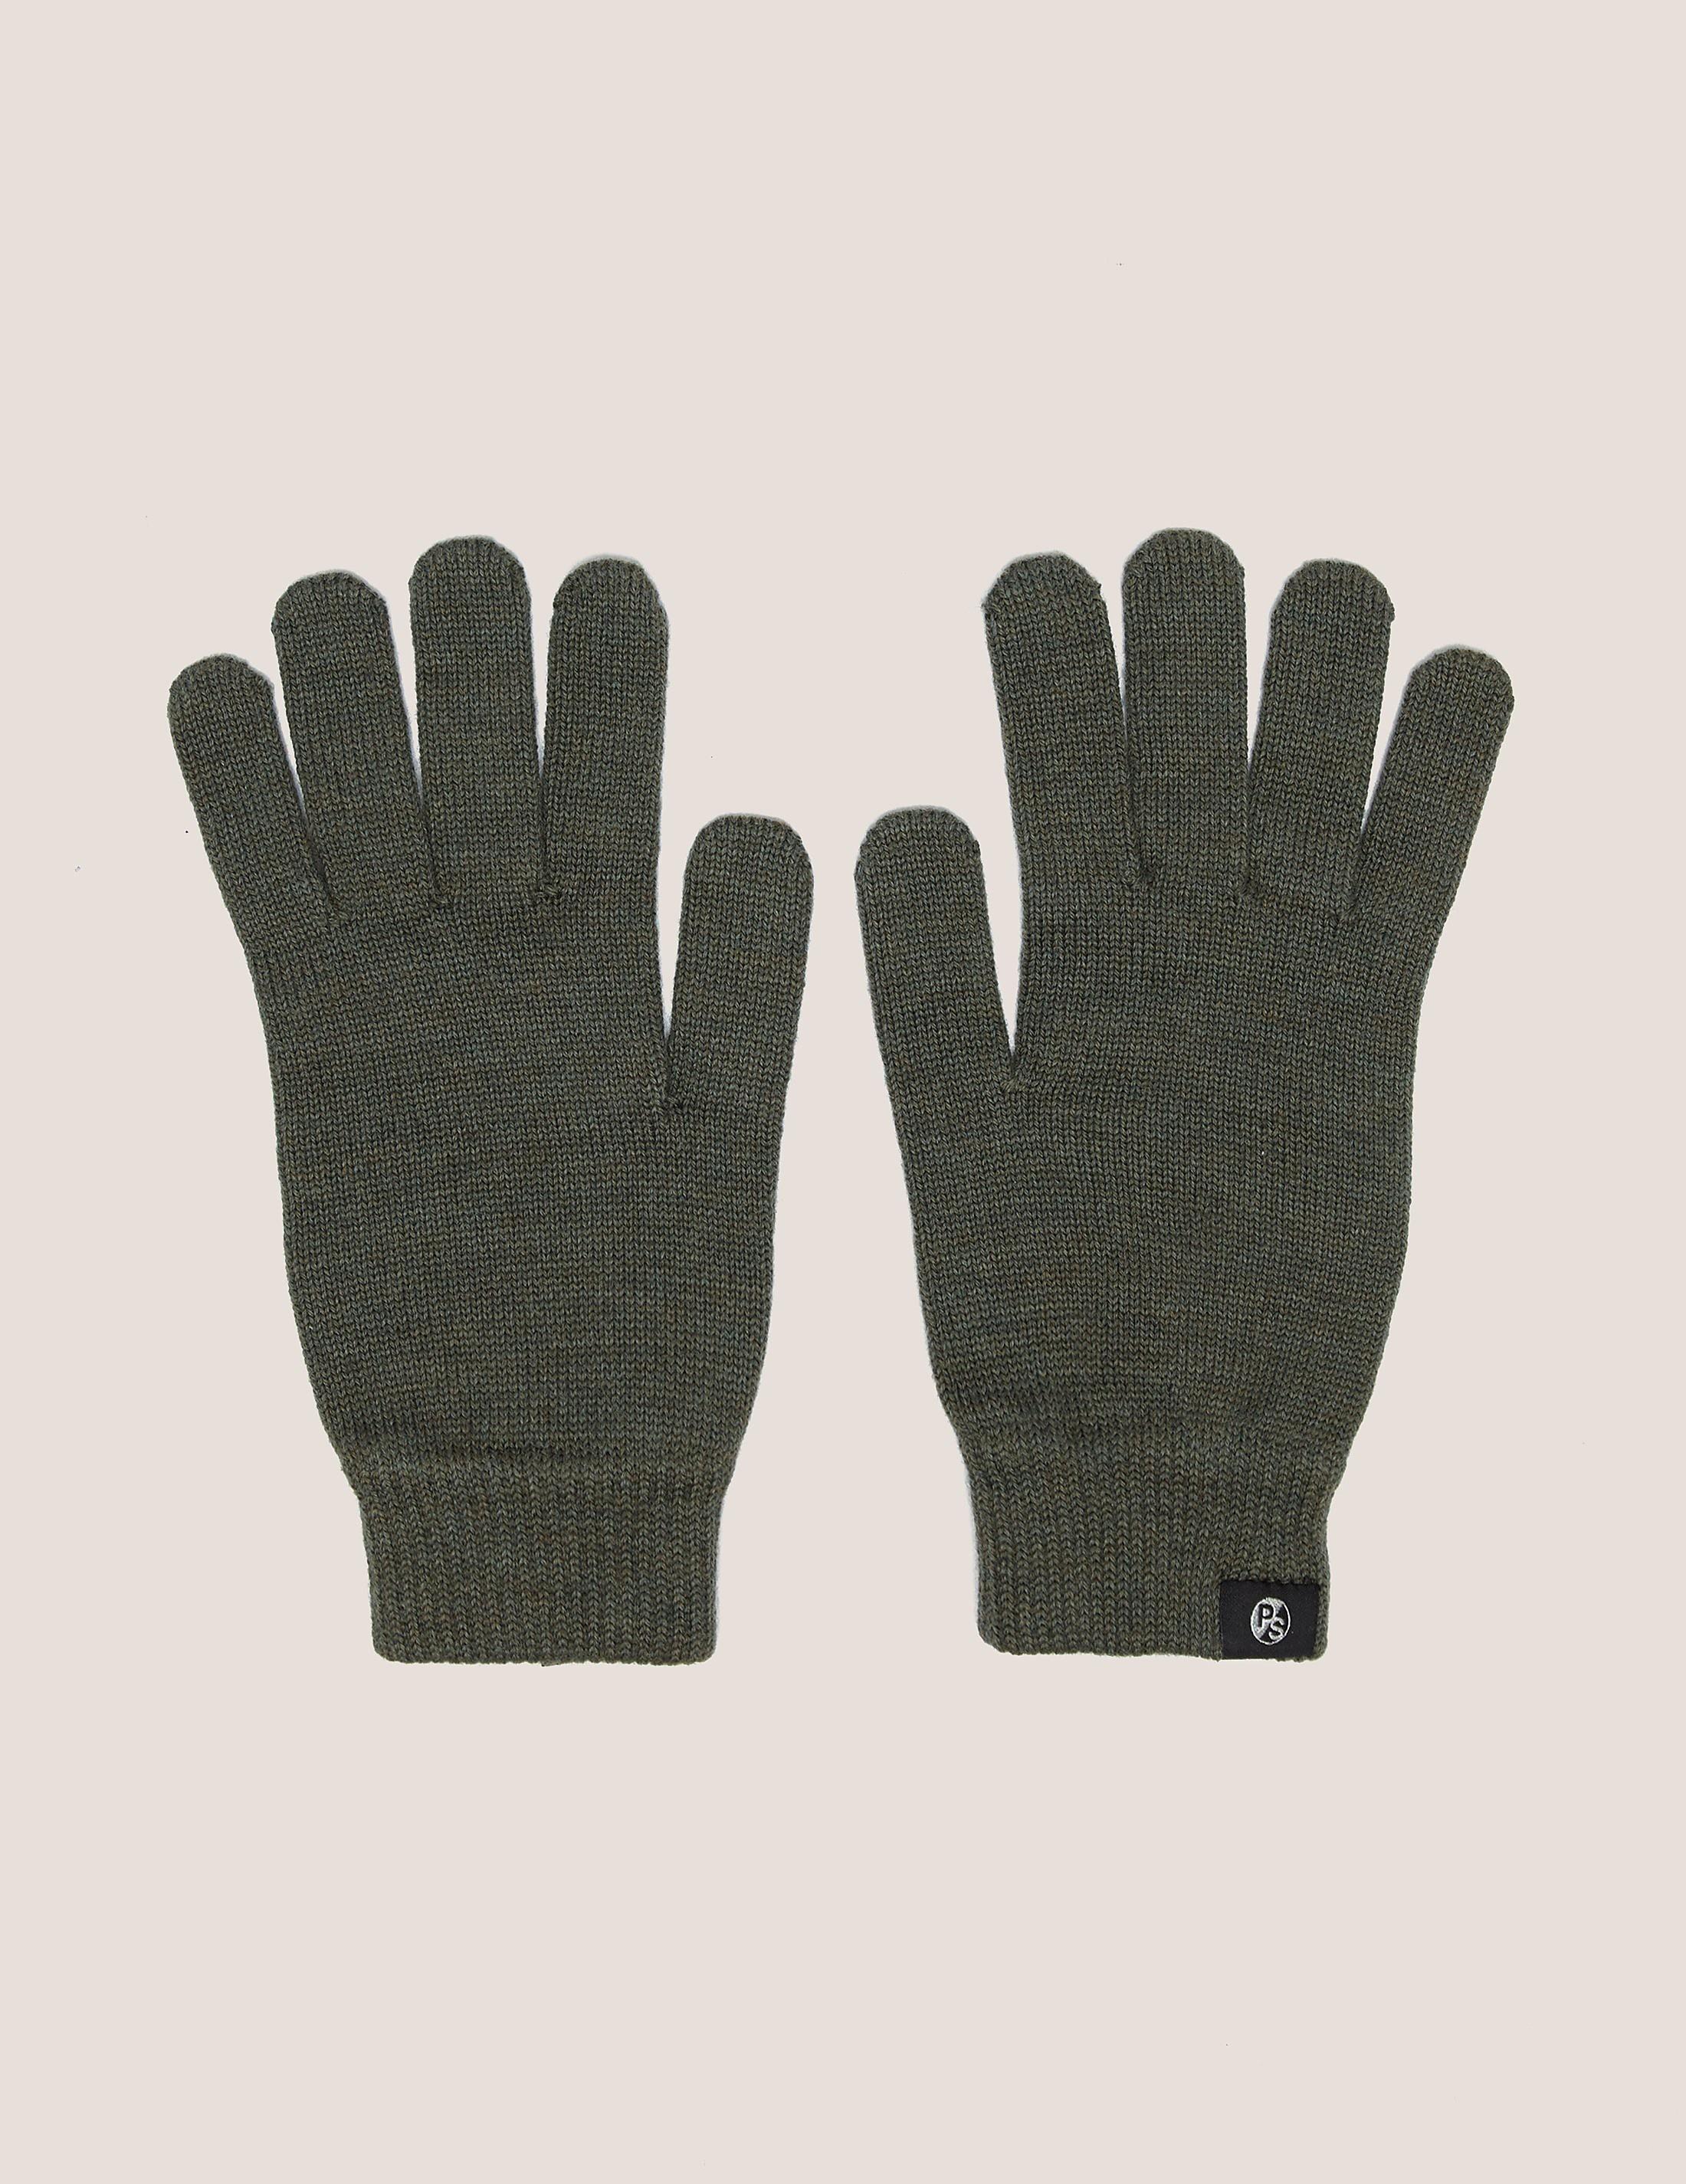 Paul Smith Merino Gloves